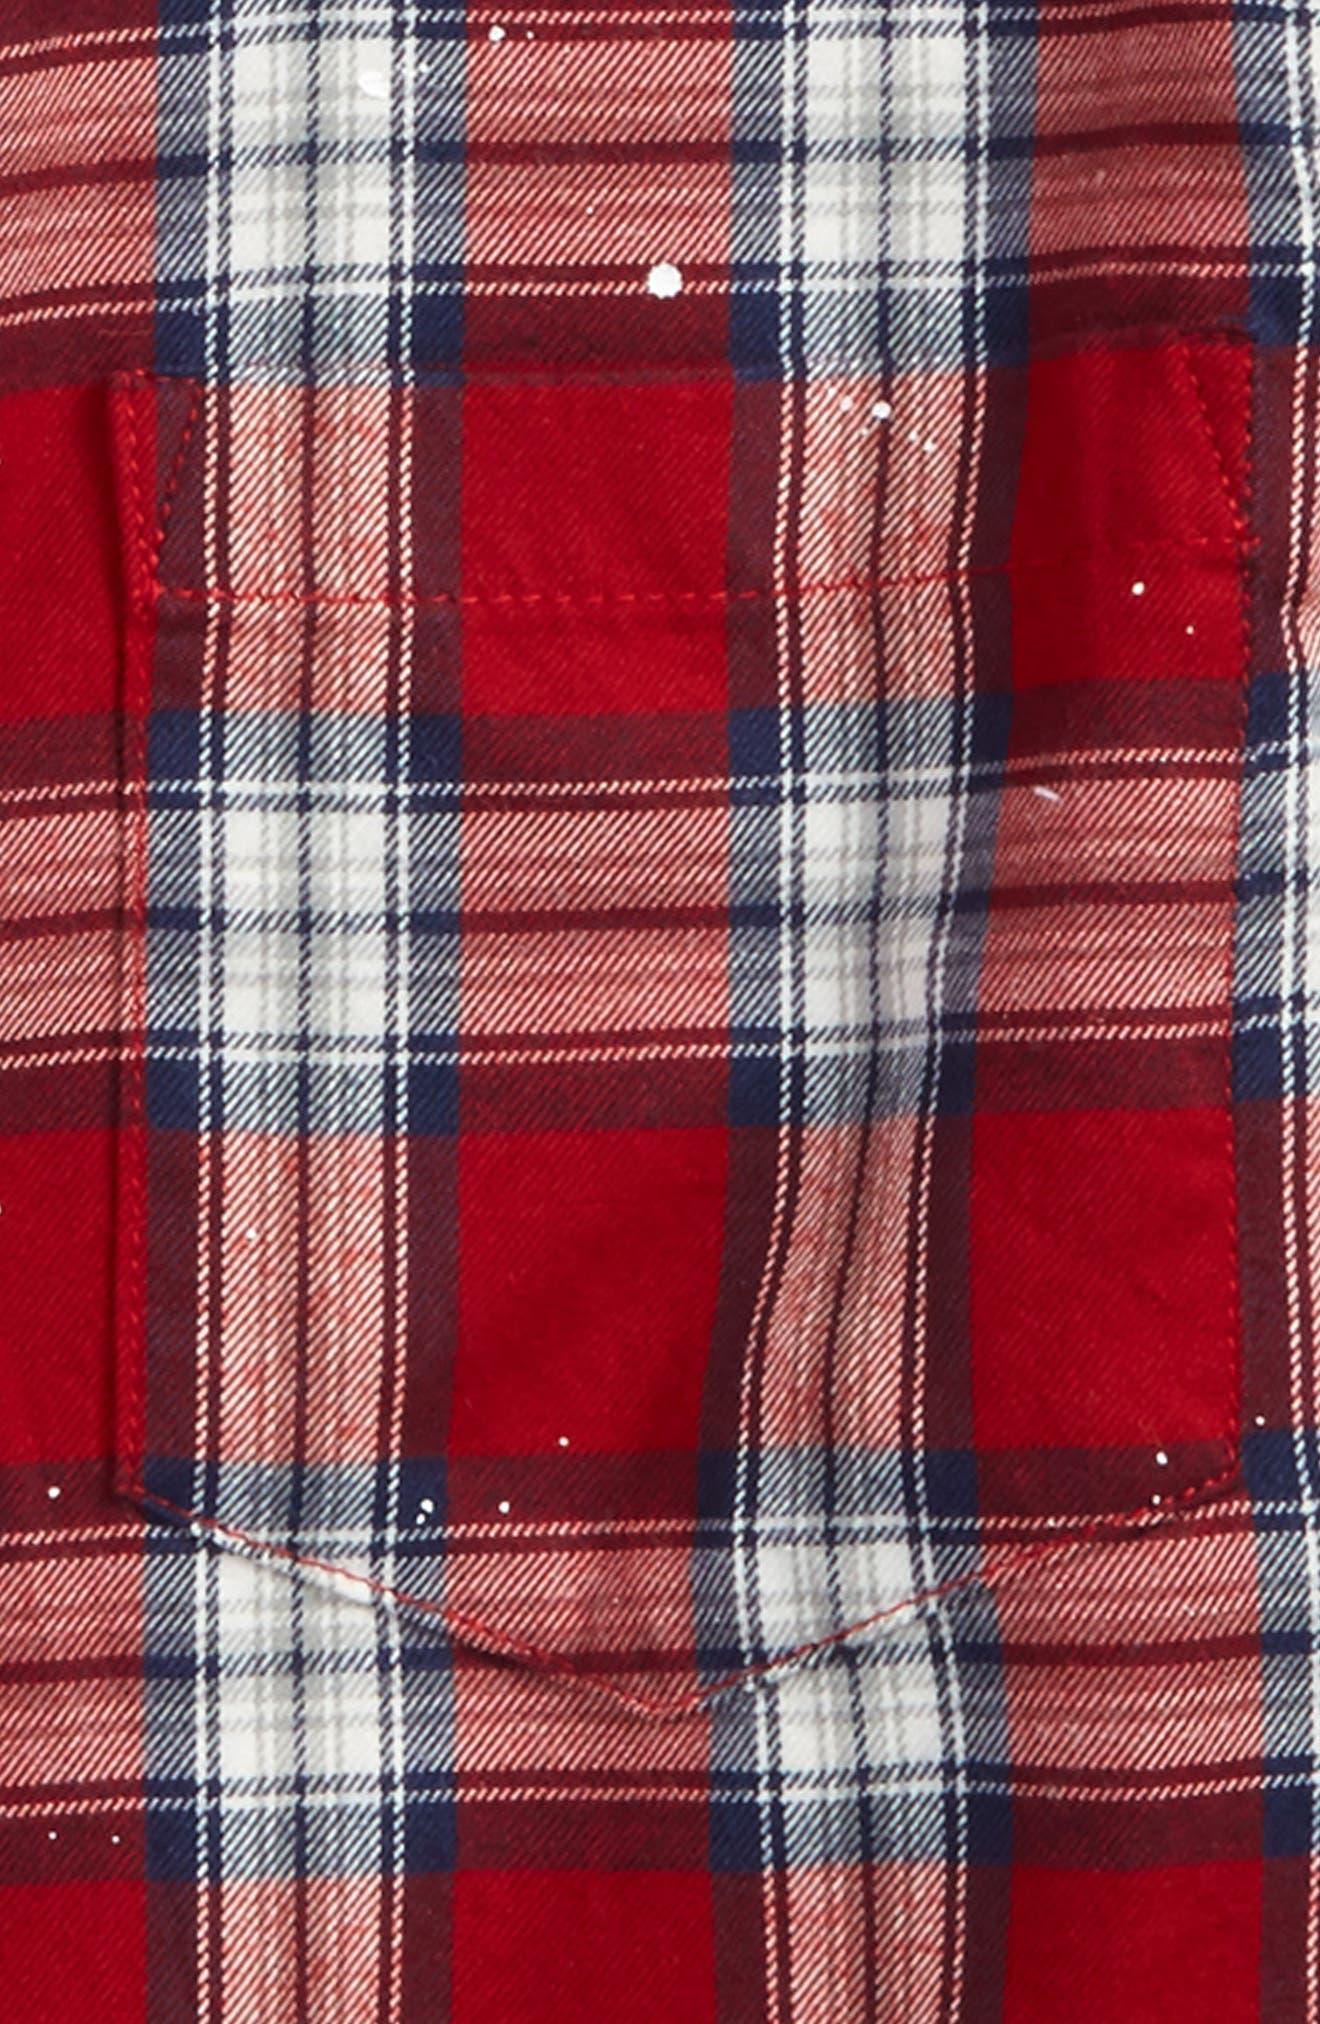 Splattered Plaid Woven Shirt,                             Alternate thumbnail 2, color,                             Red Plaid Paint Splatters